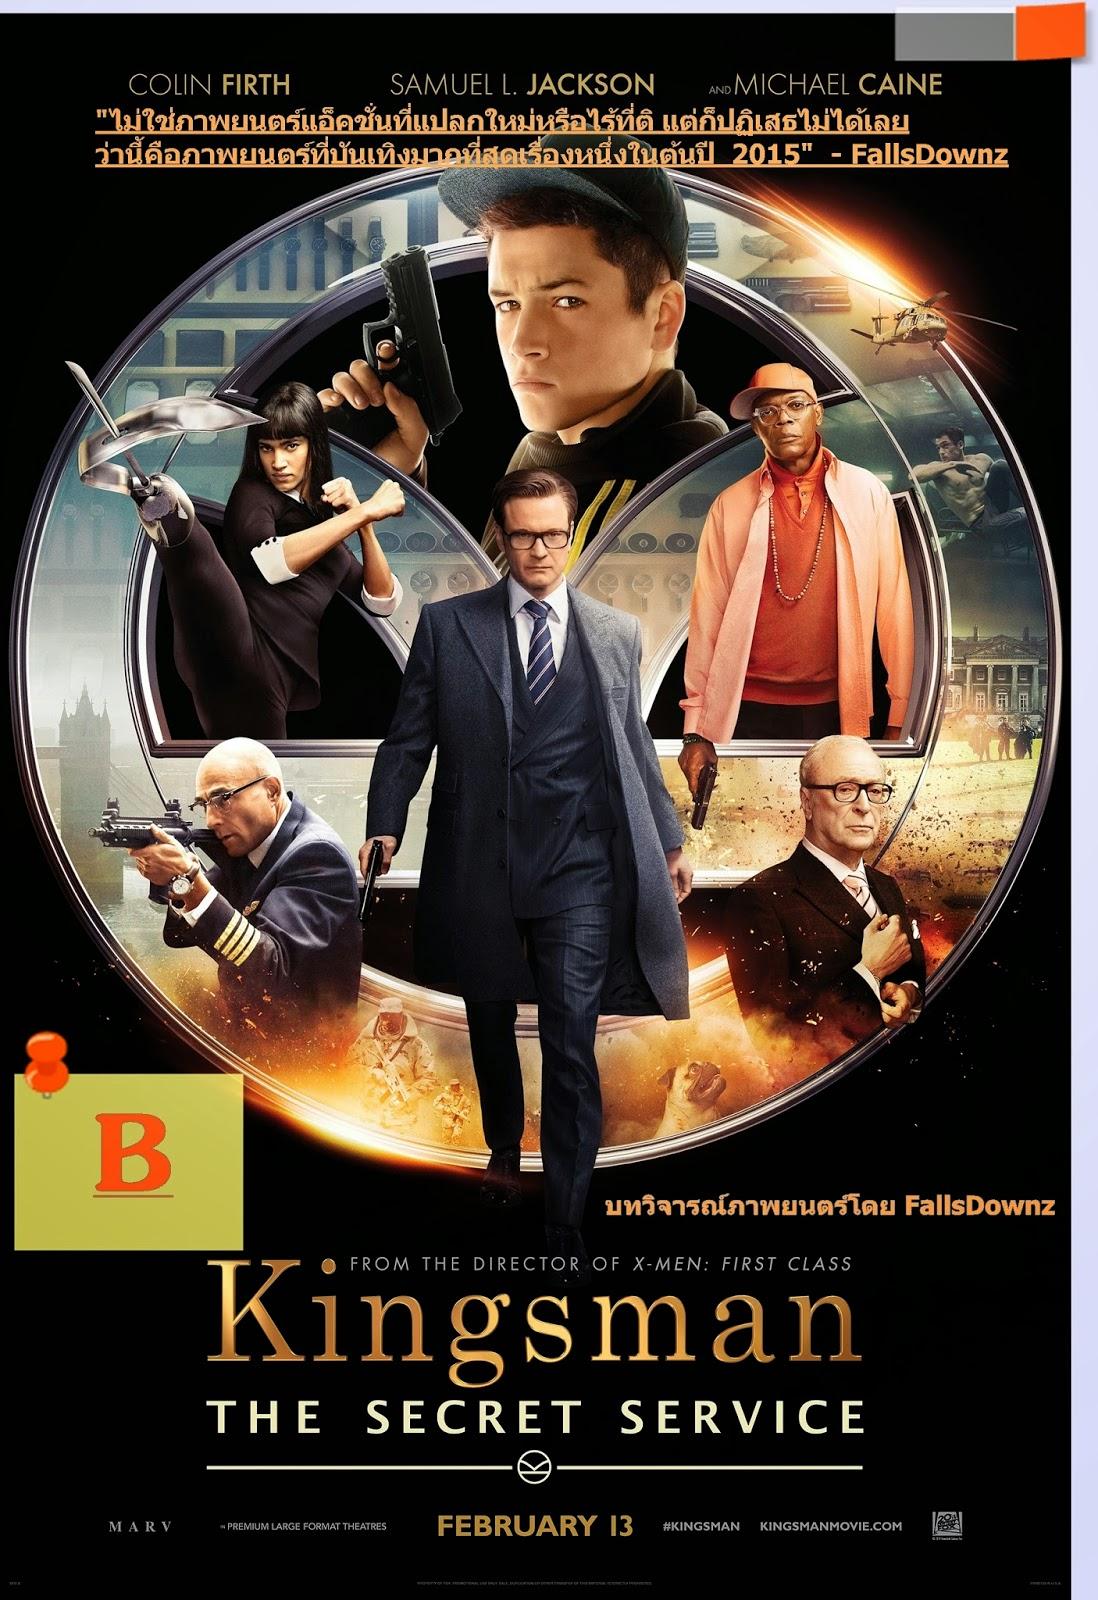 fallsdownz movies amp games reviews kingsman the secret